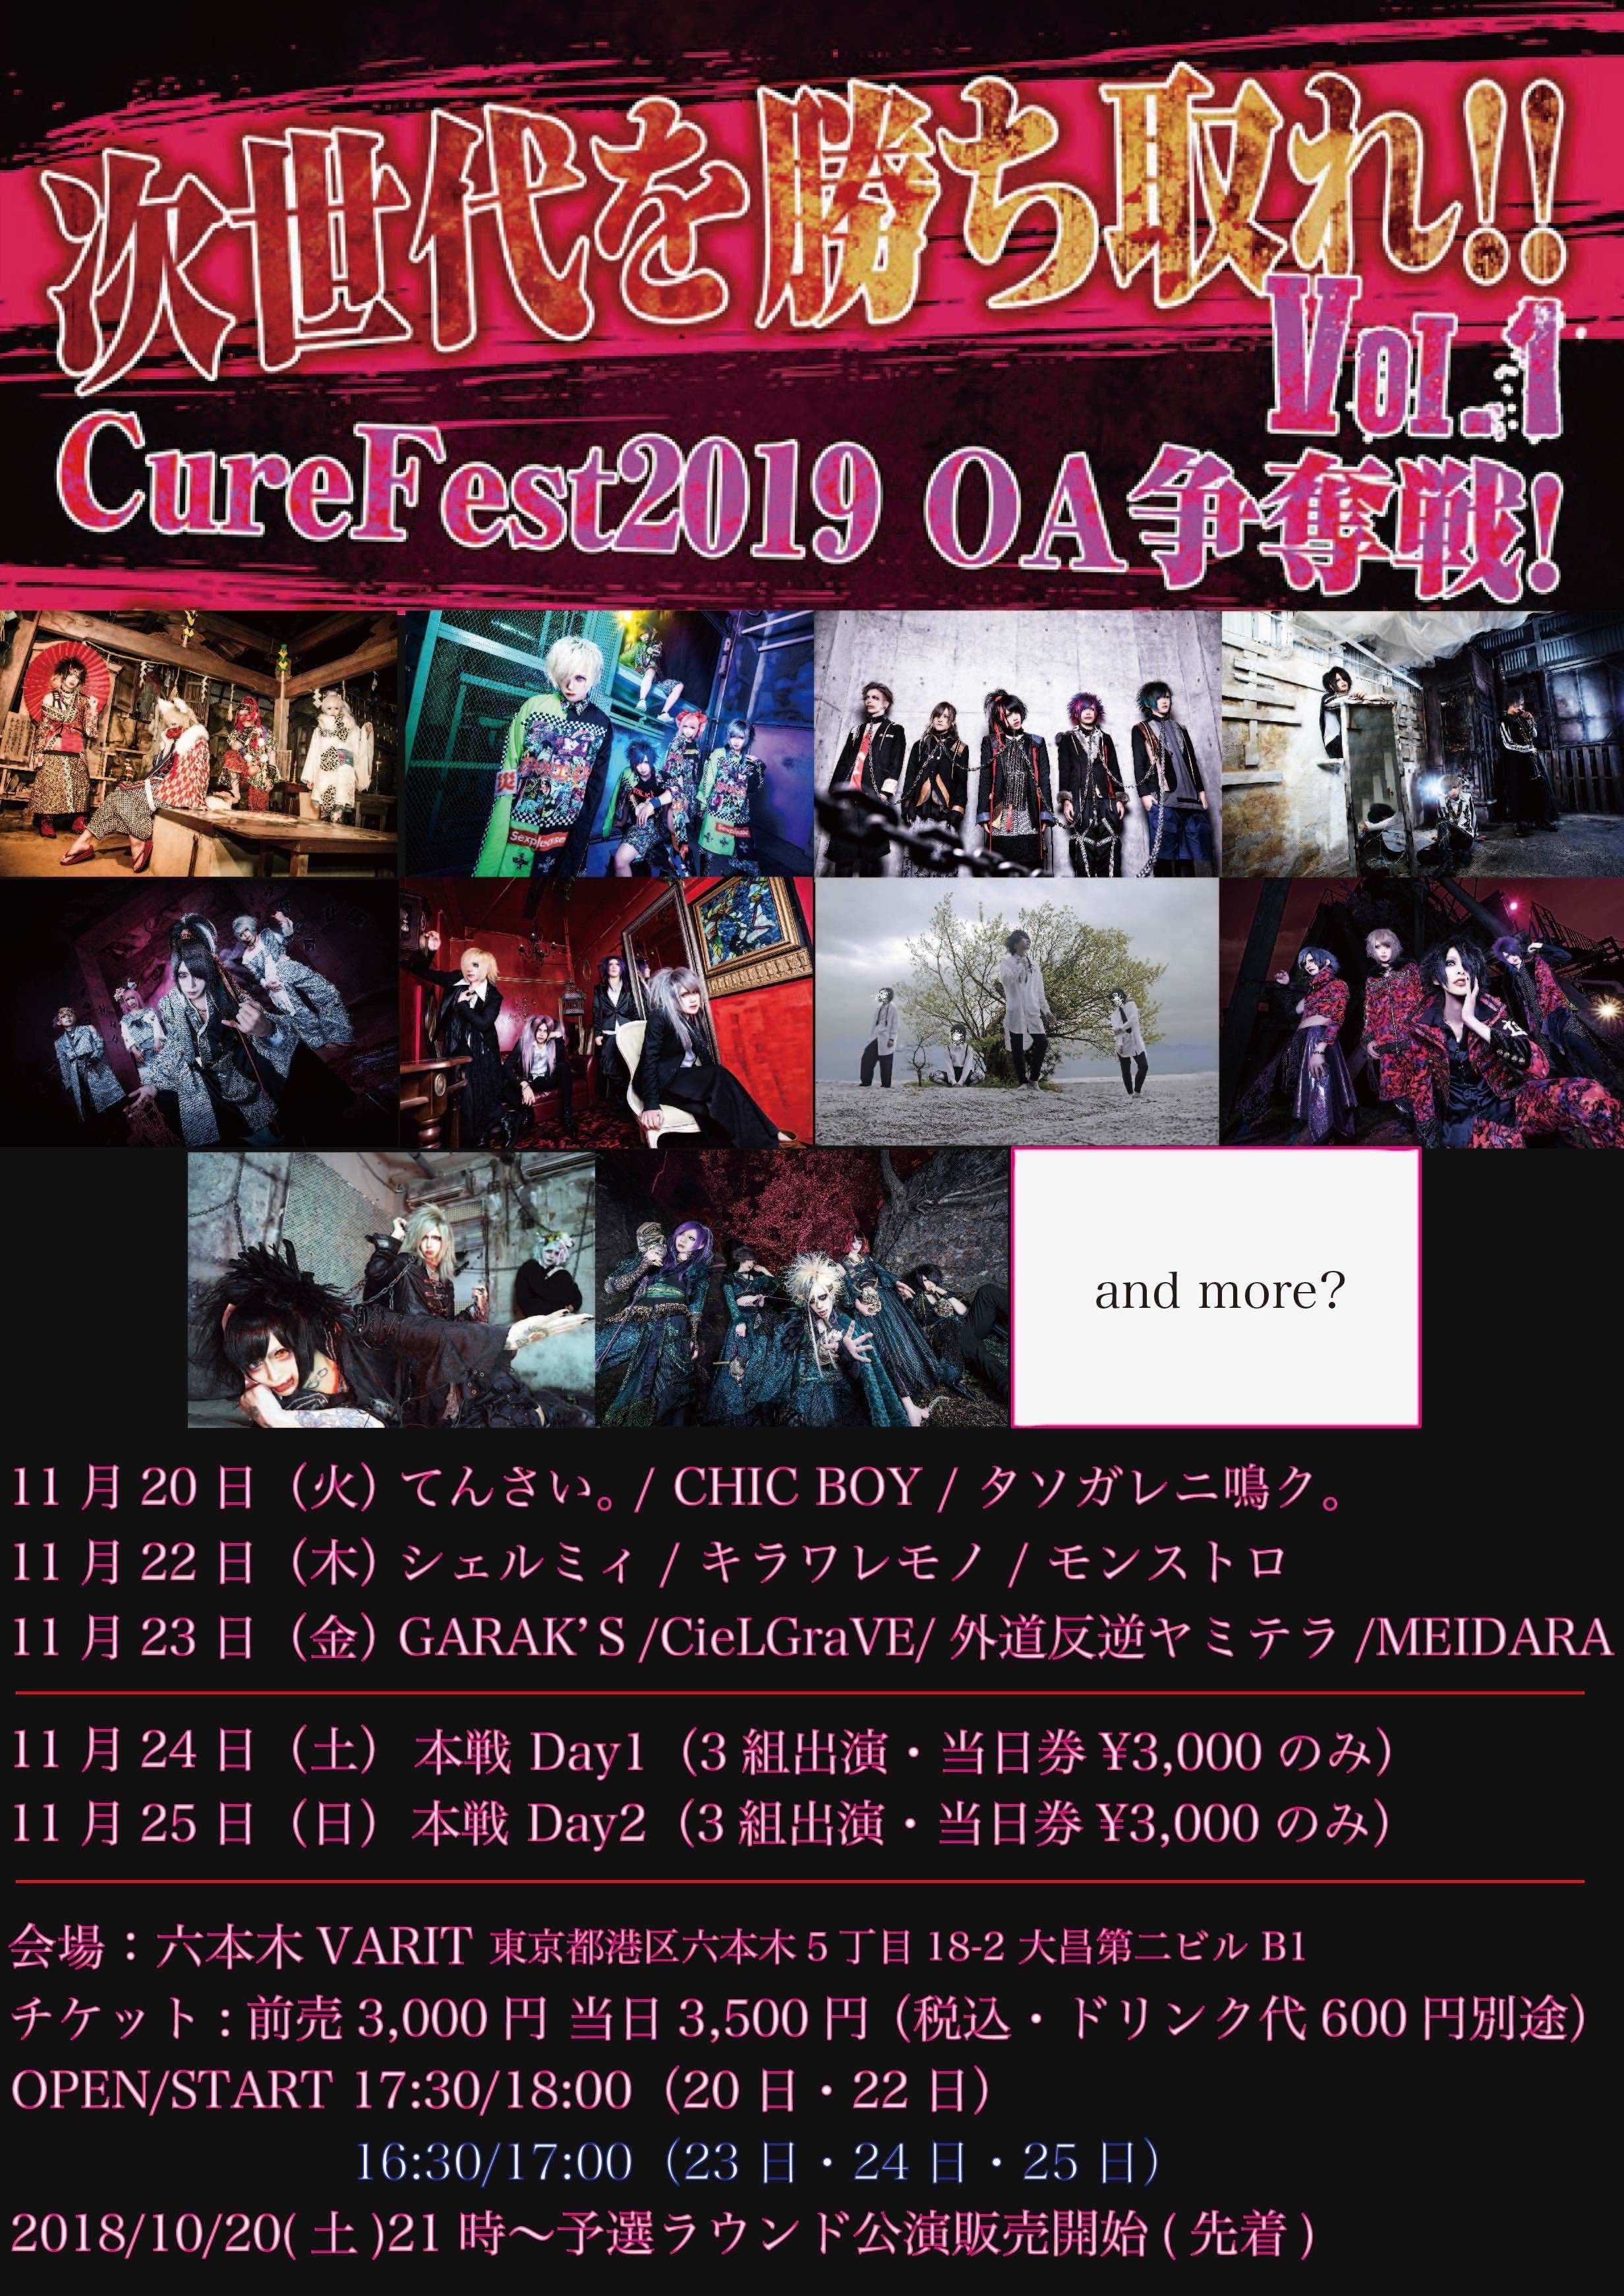 『CureFest2019 OA争奪戦!vol.1』(11/20公演)